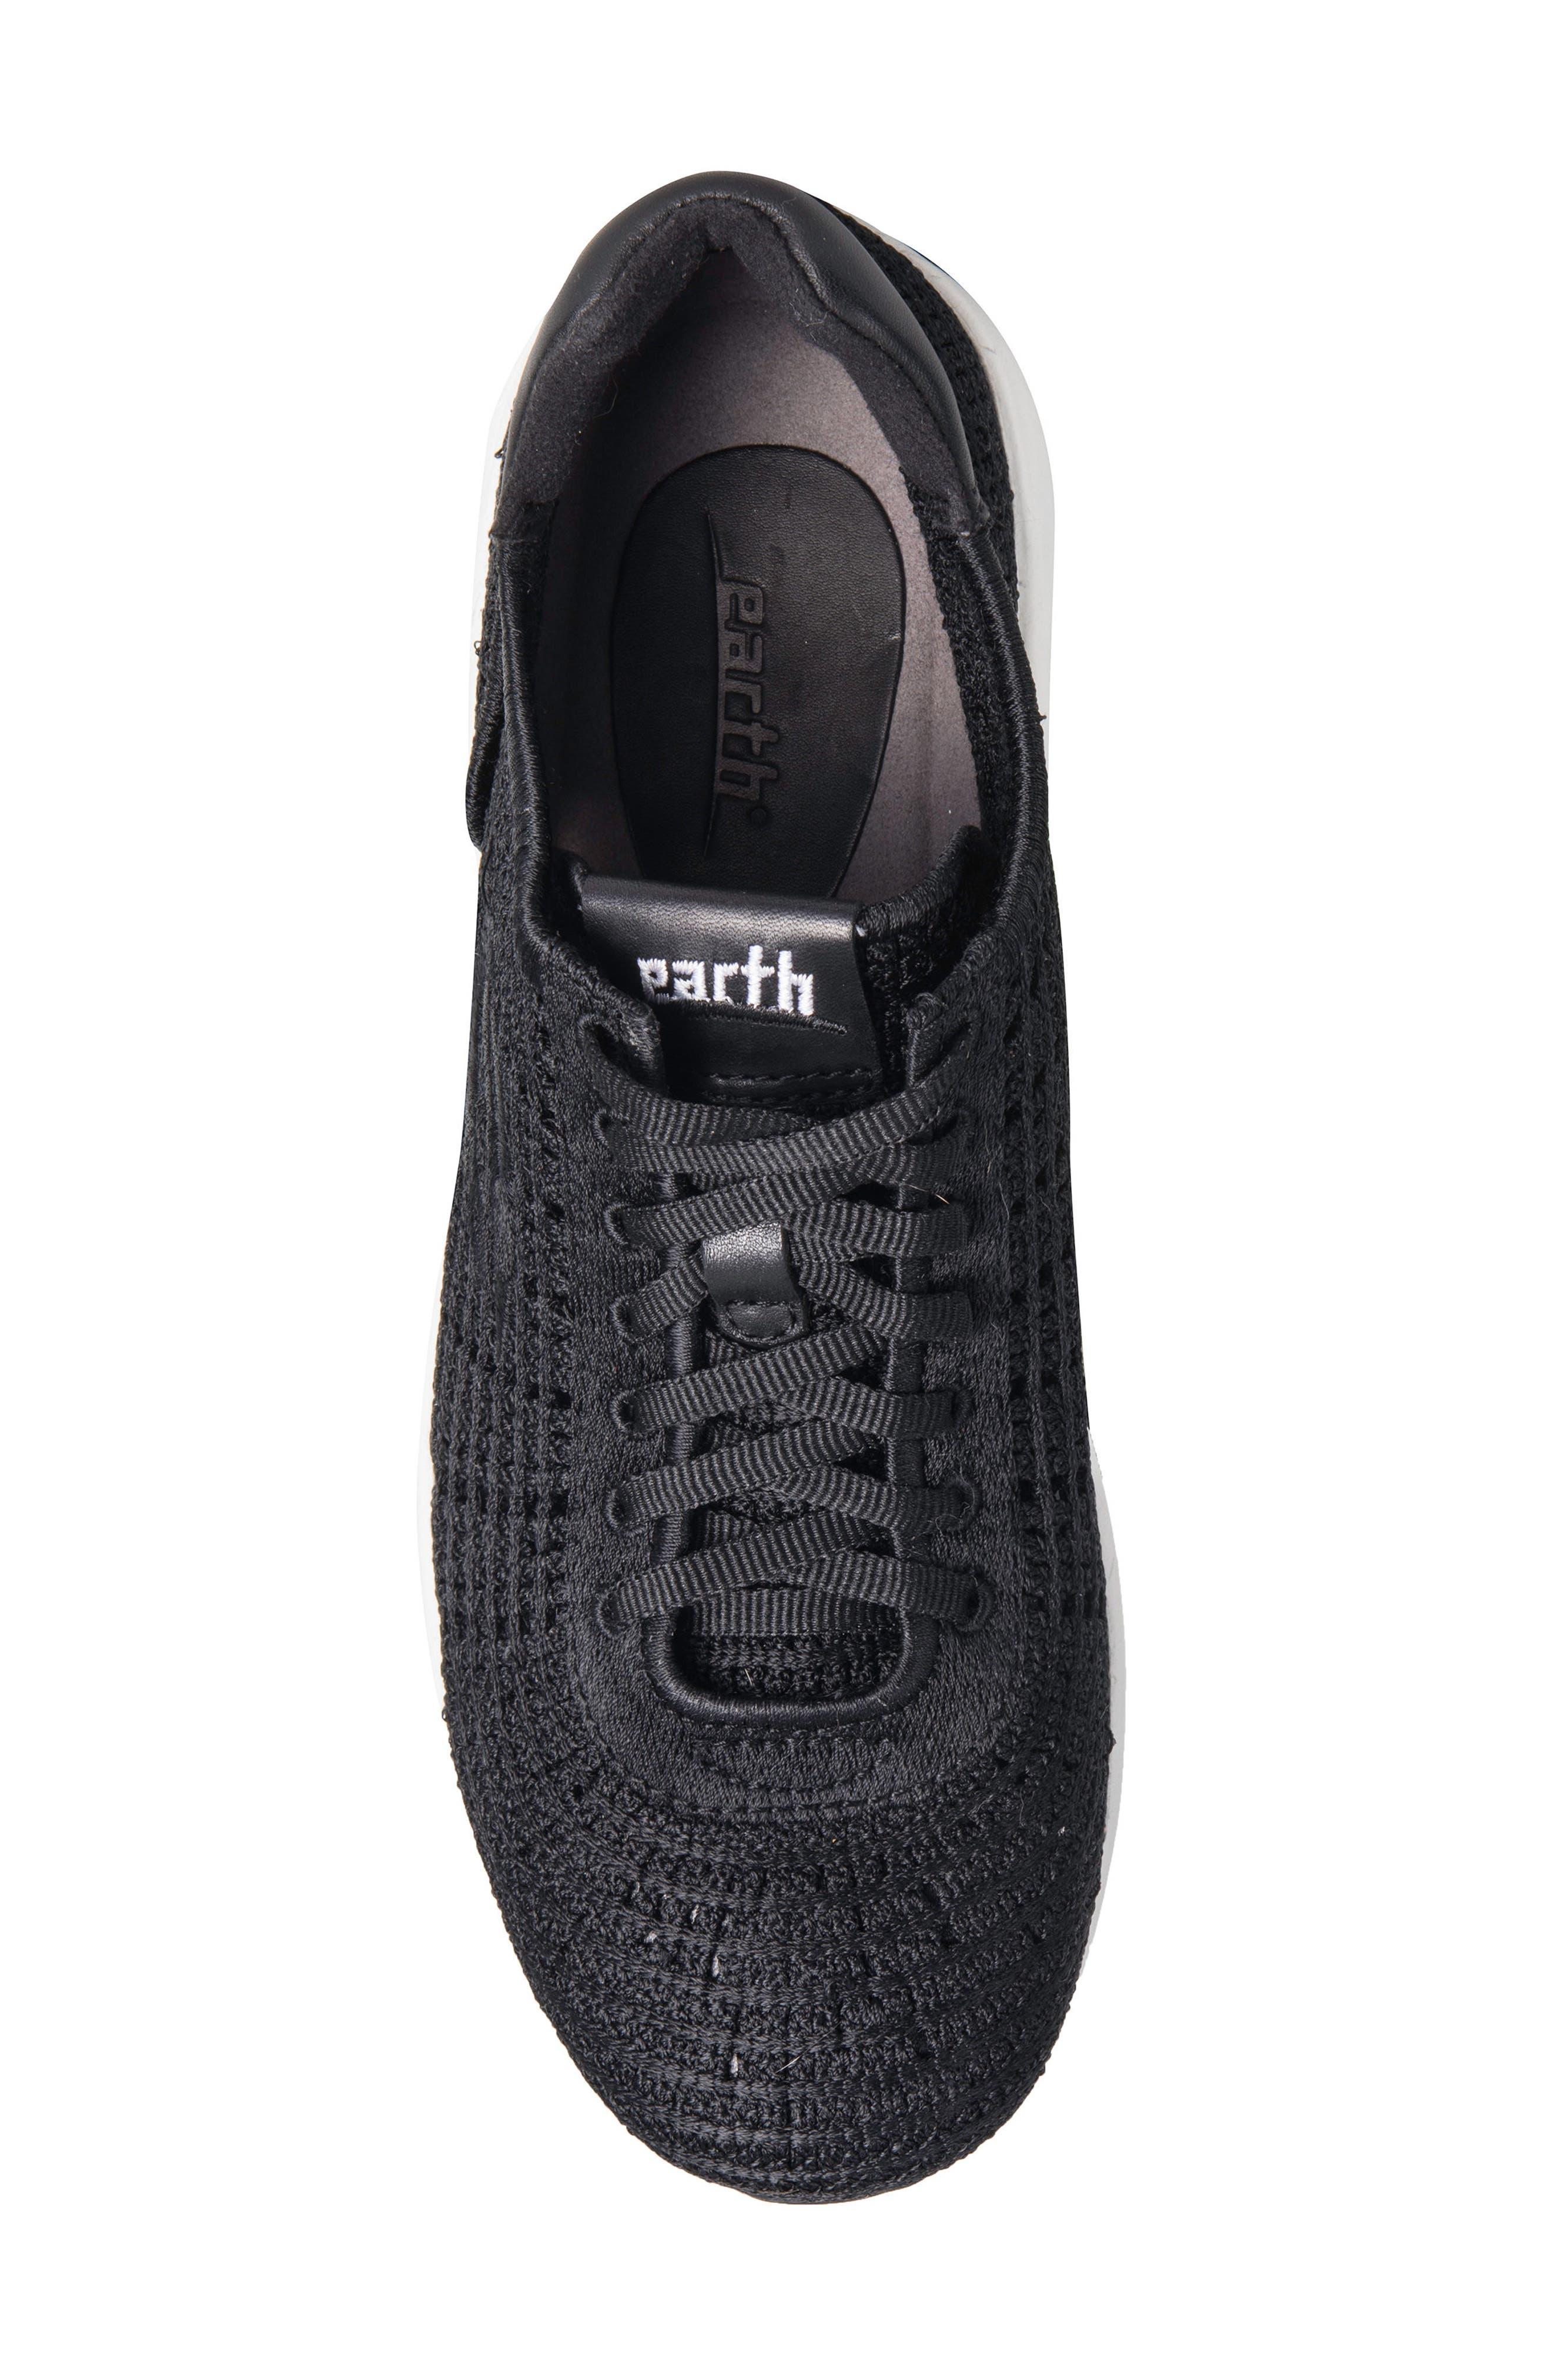 Earth Vital Sneaker,                             Alternate thumbnail 5, color,                             Black